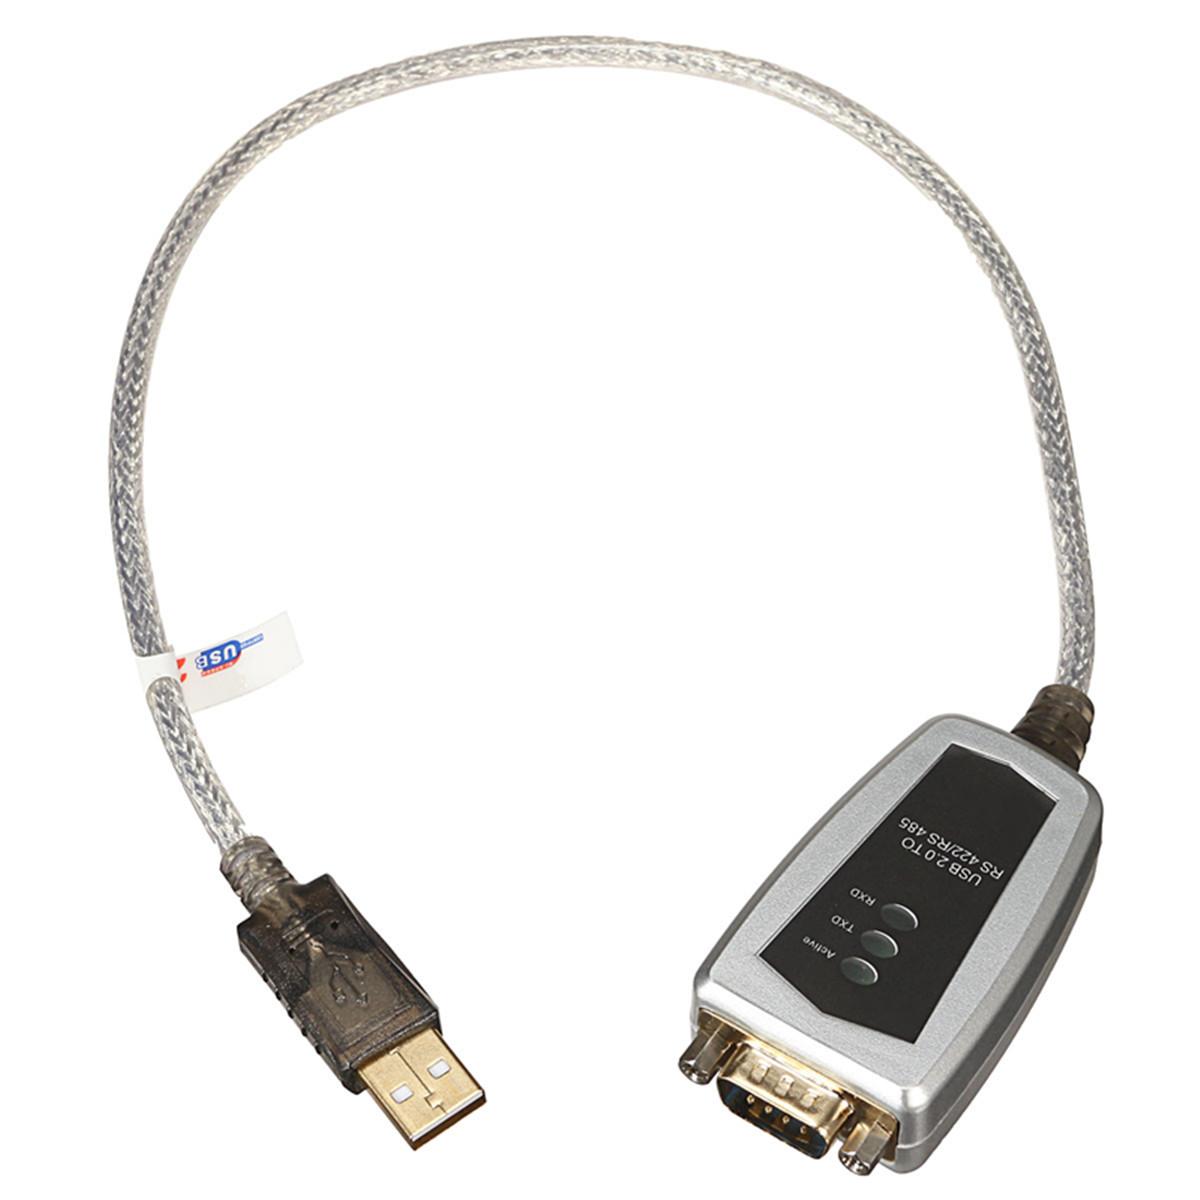 USB до RS485 RS422 Последовательный DB9 к переходному кабелю последовательного преобразователя Termi - фото 3